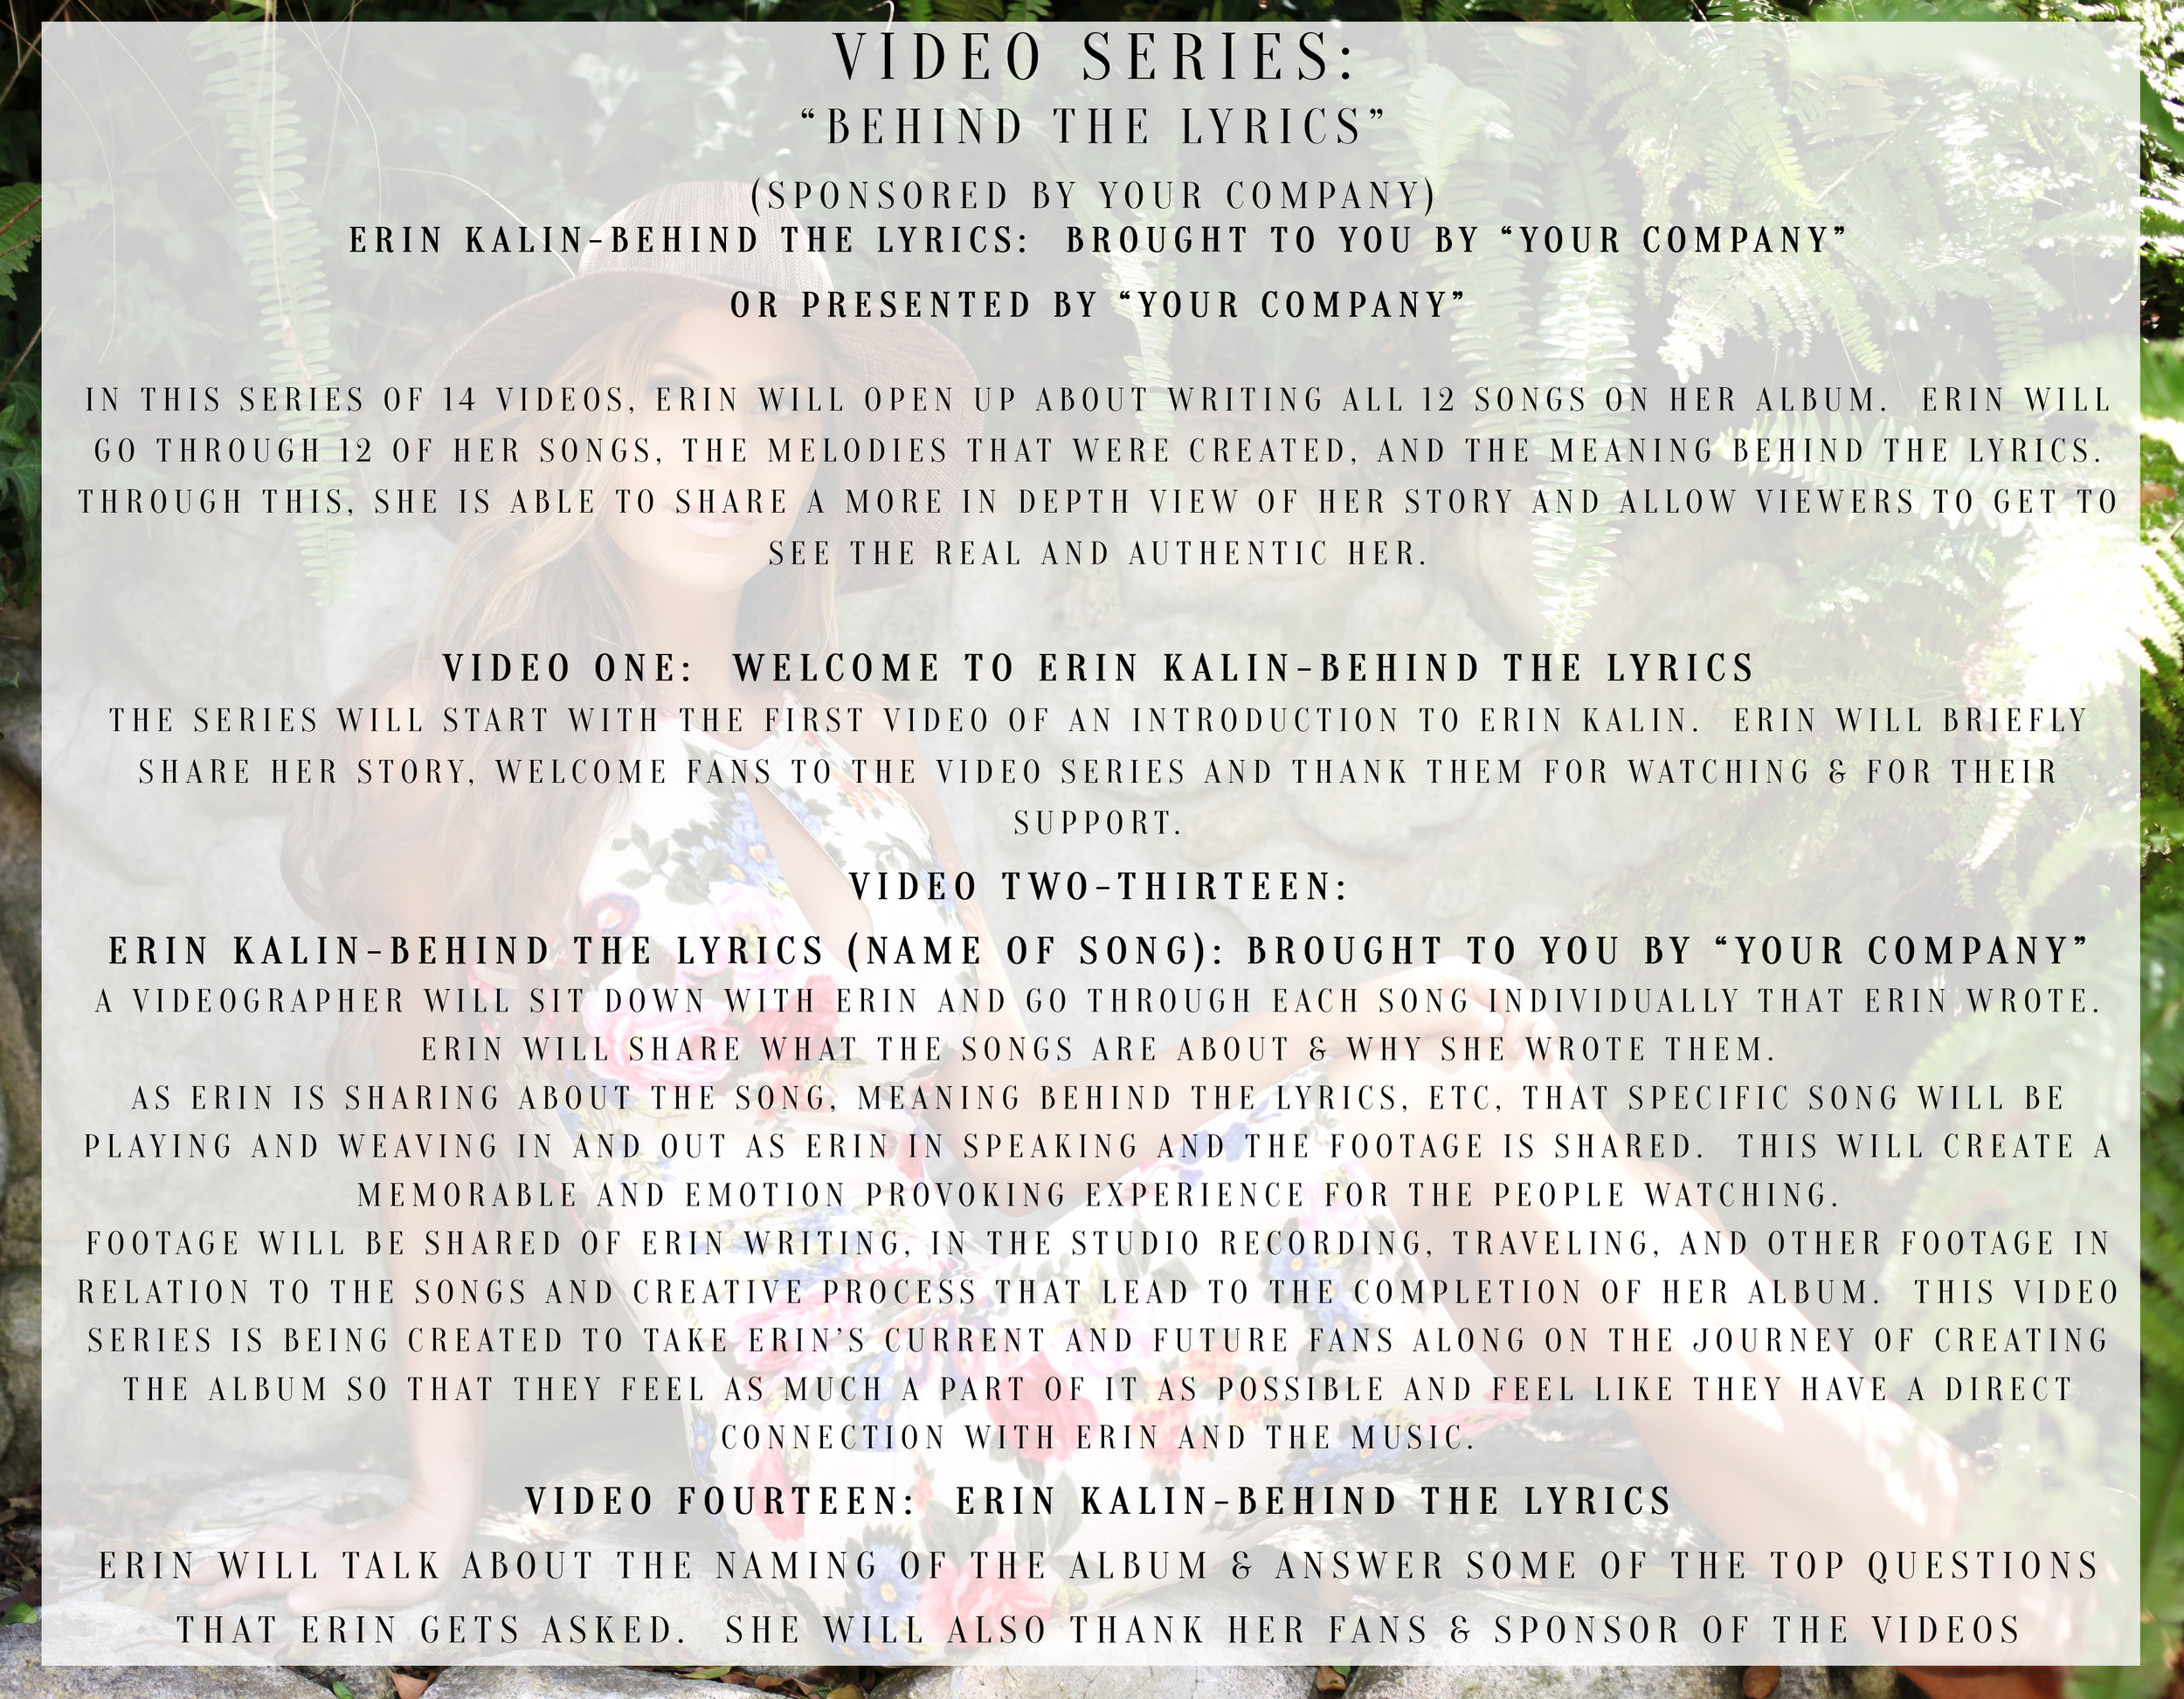 VIDEO SERIES: Behind The Lyrics